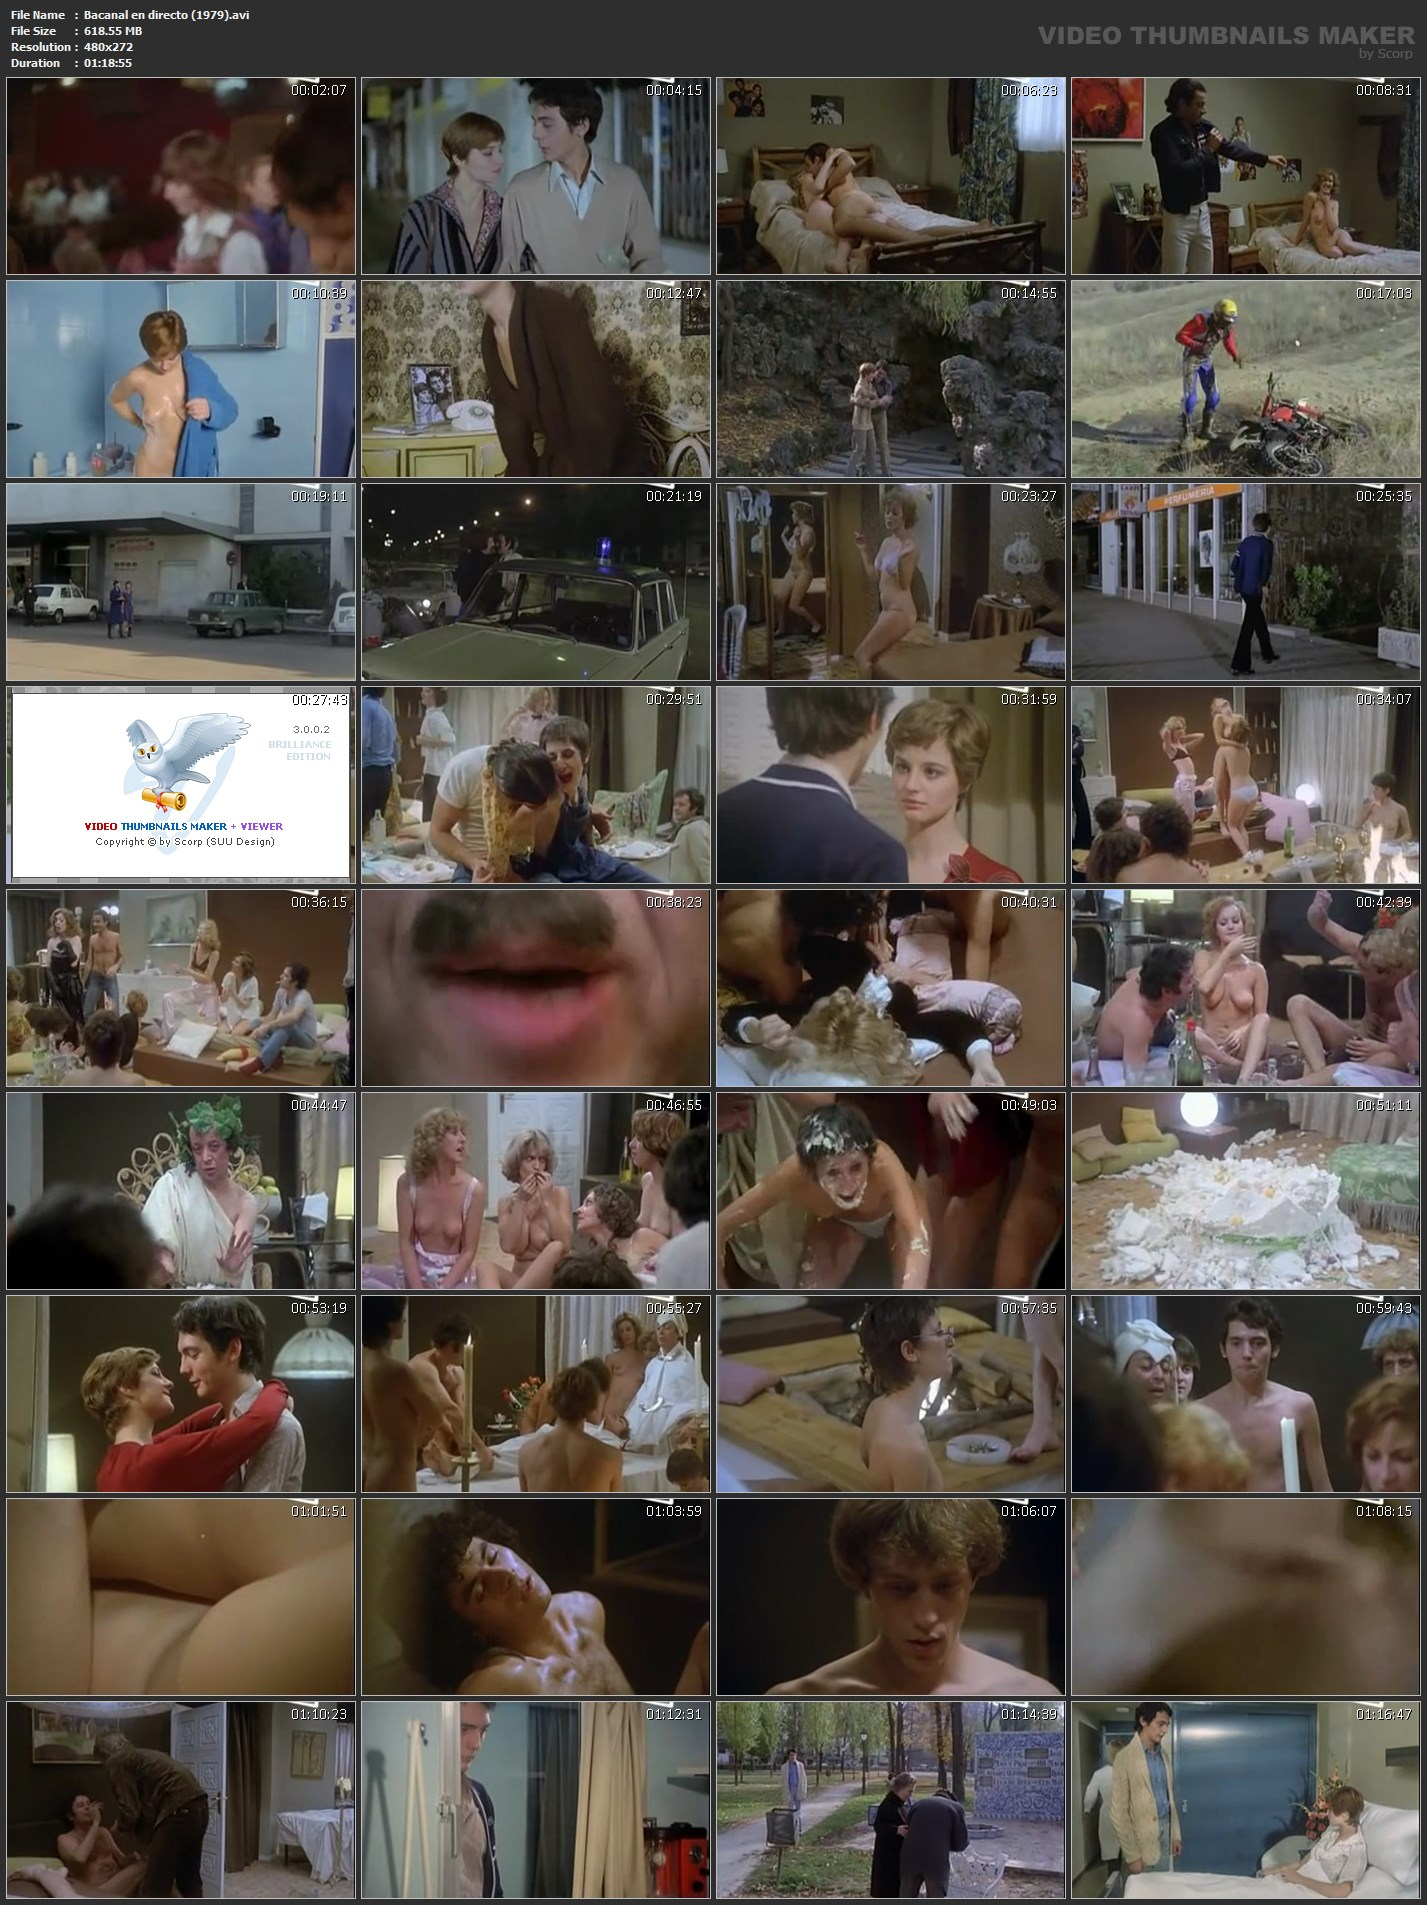 Bacanal en directo 1979 - 5 2